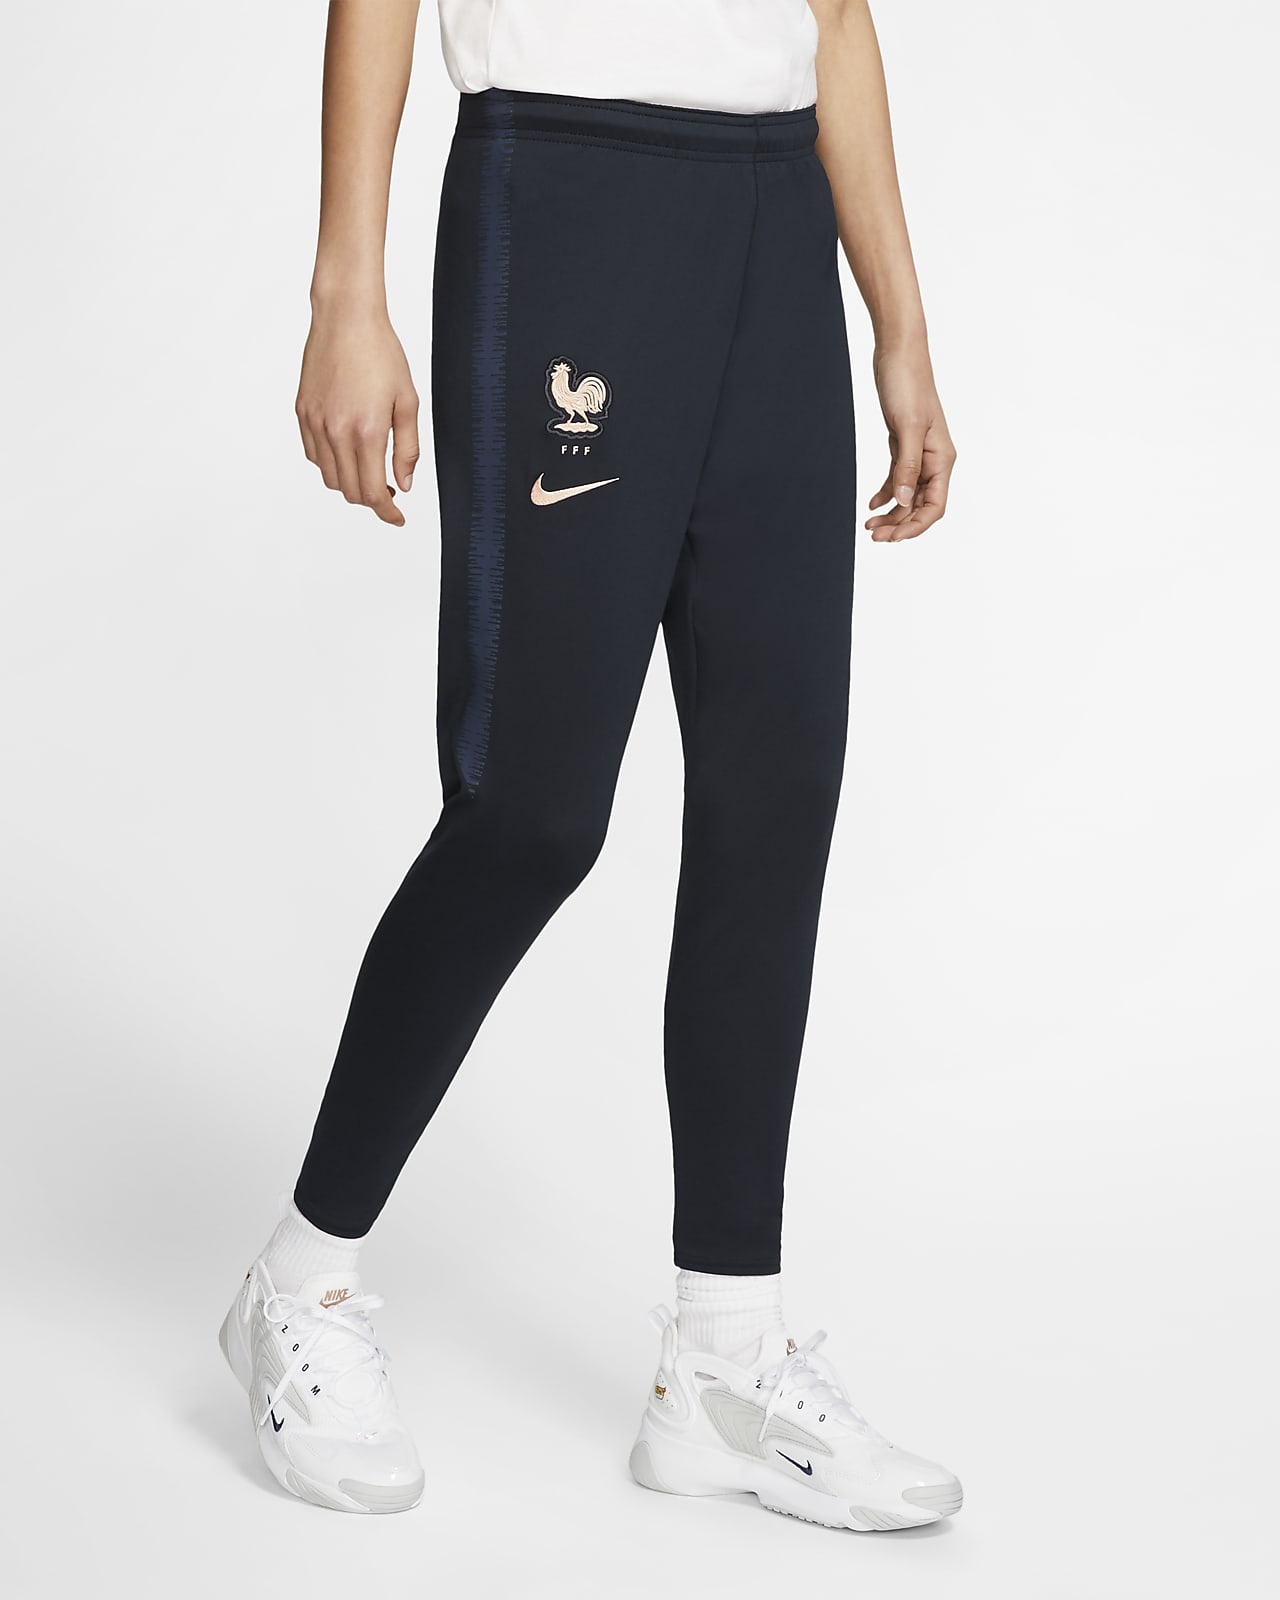 FFF Squad Women's Football Pants